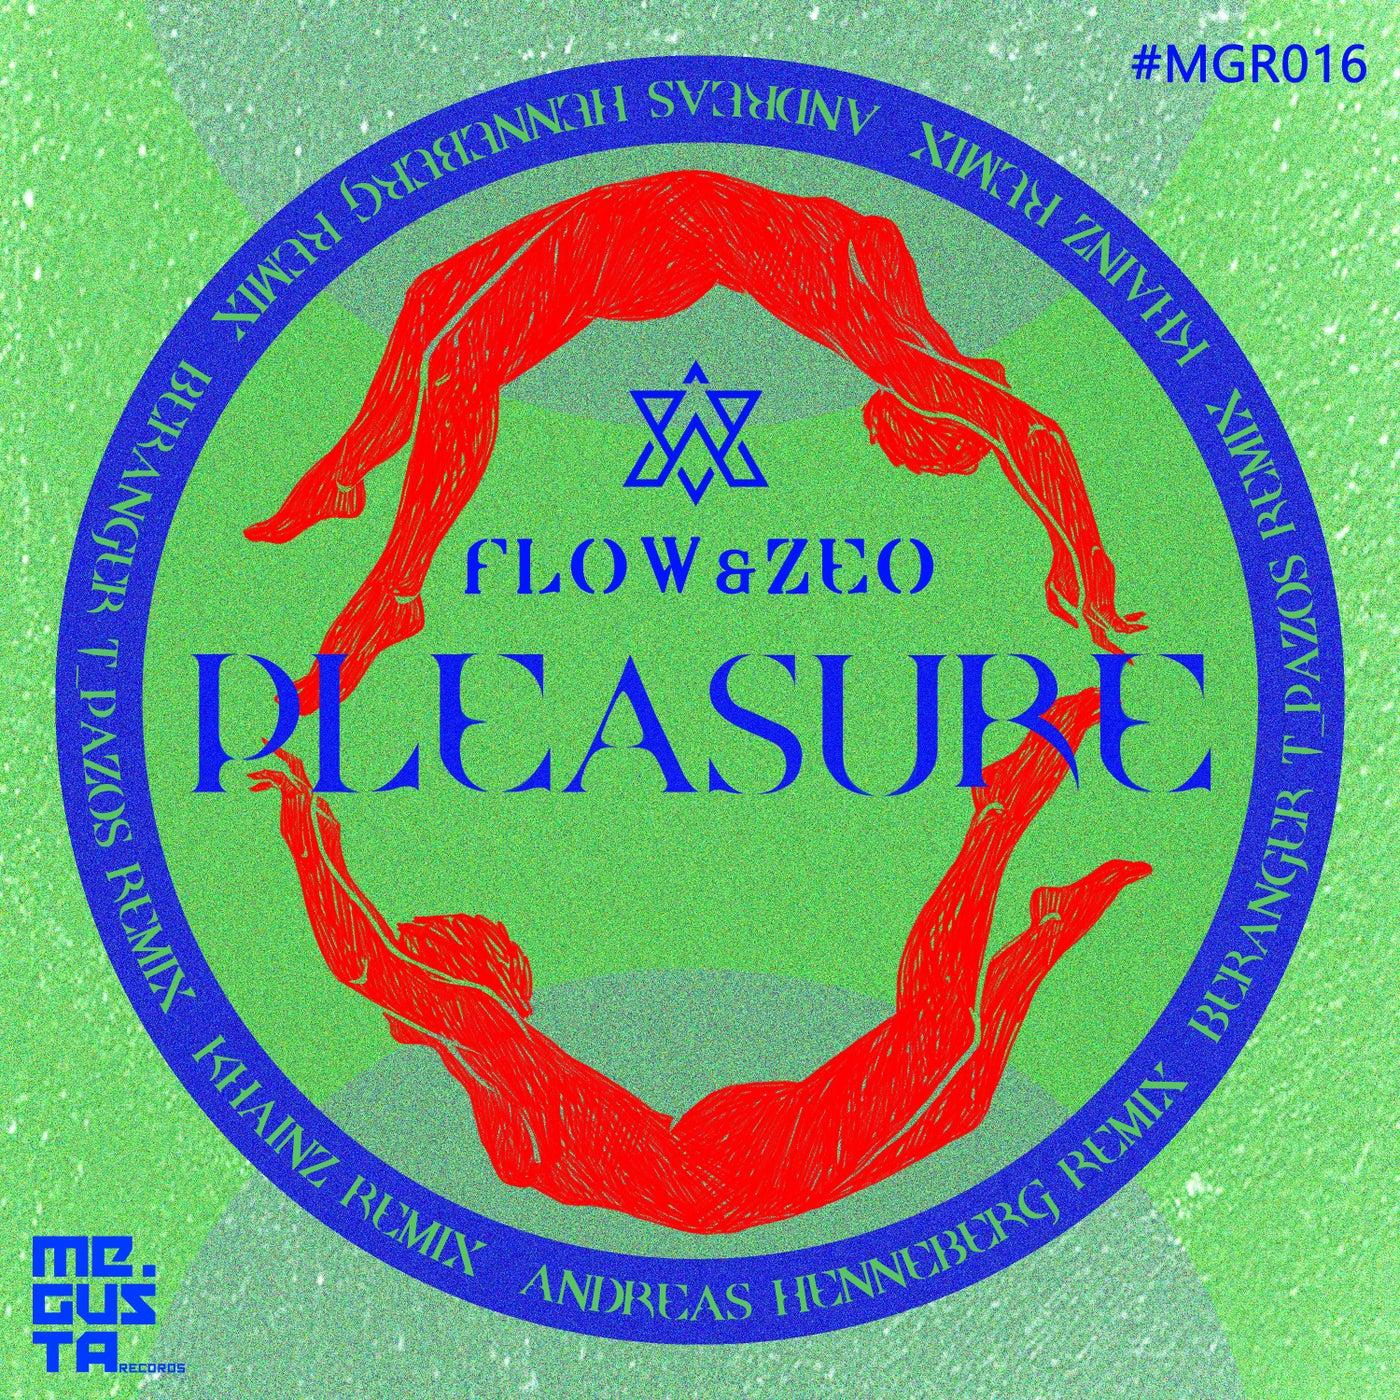 Pleasure (Khainz Remix)